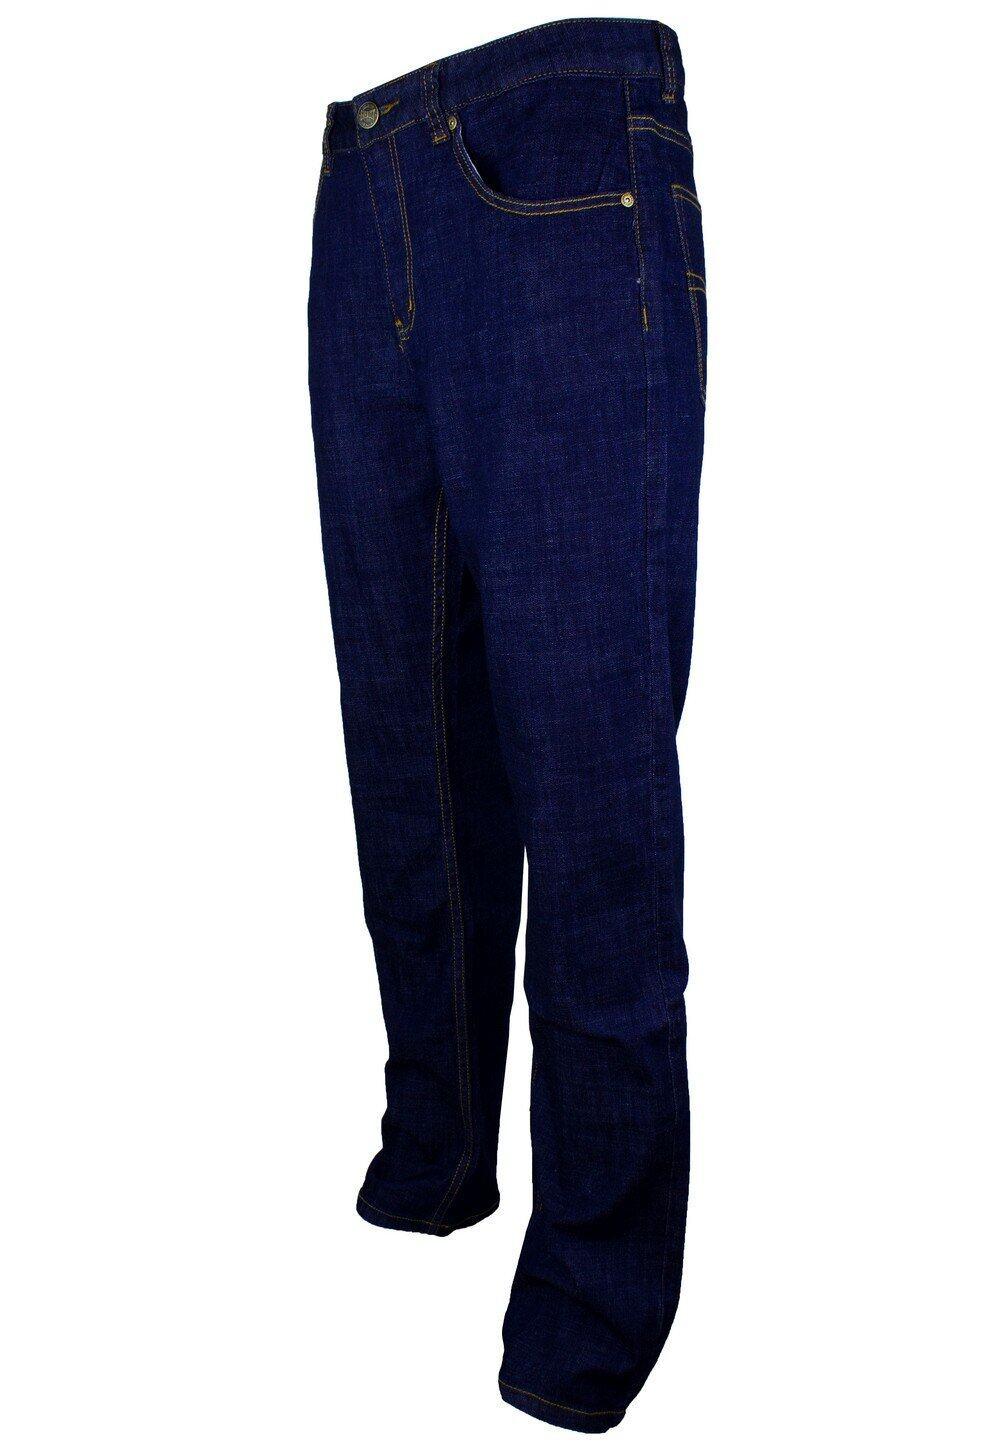 Exhaust Stretch Straight Cut Denim Long Pant 912